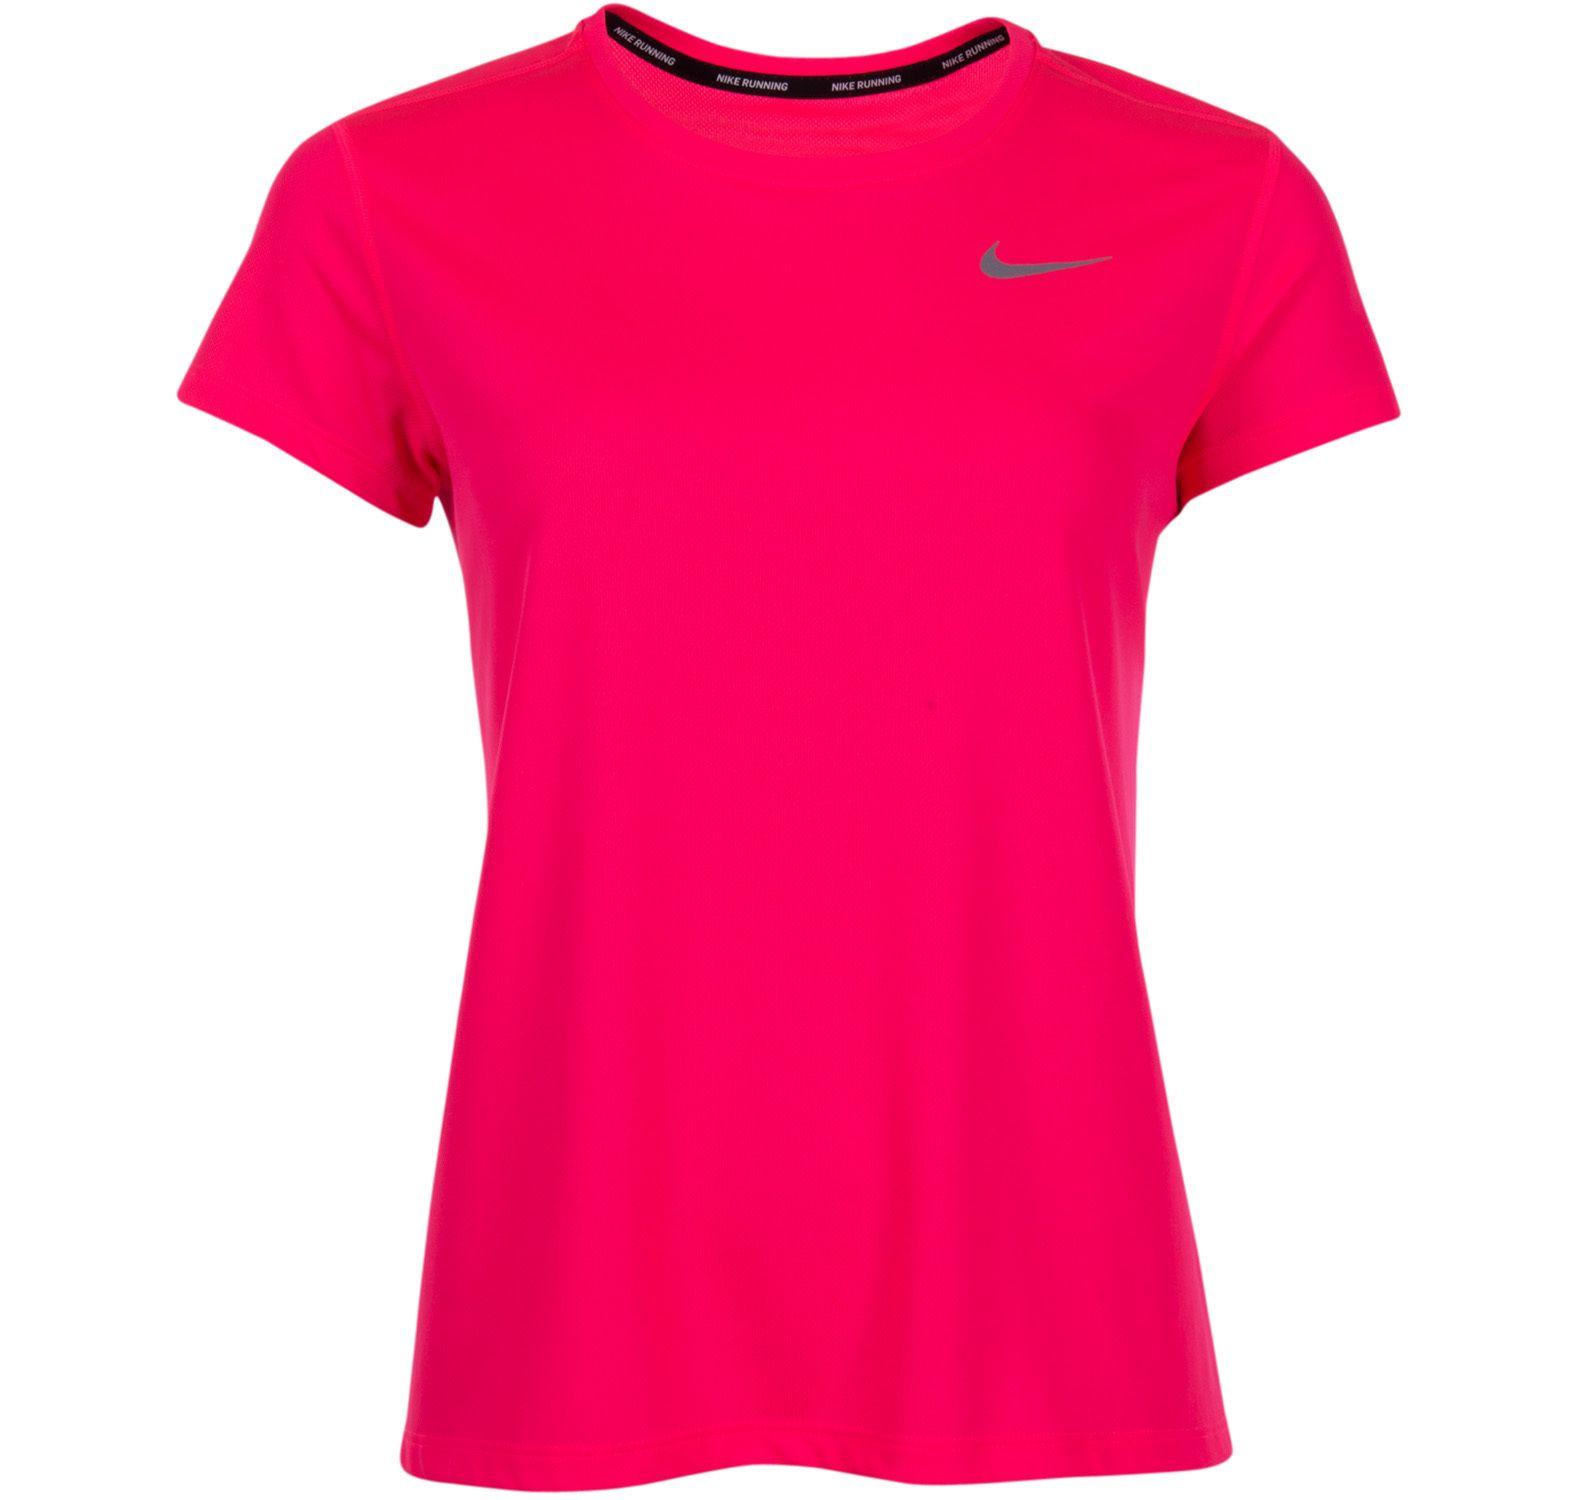 W Nk Brthe Rapid Top Ss, Racer Pink/Racer Pink, Xs,  Nike